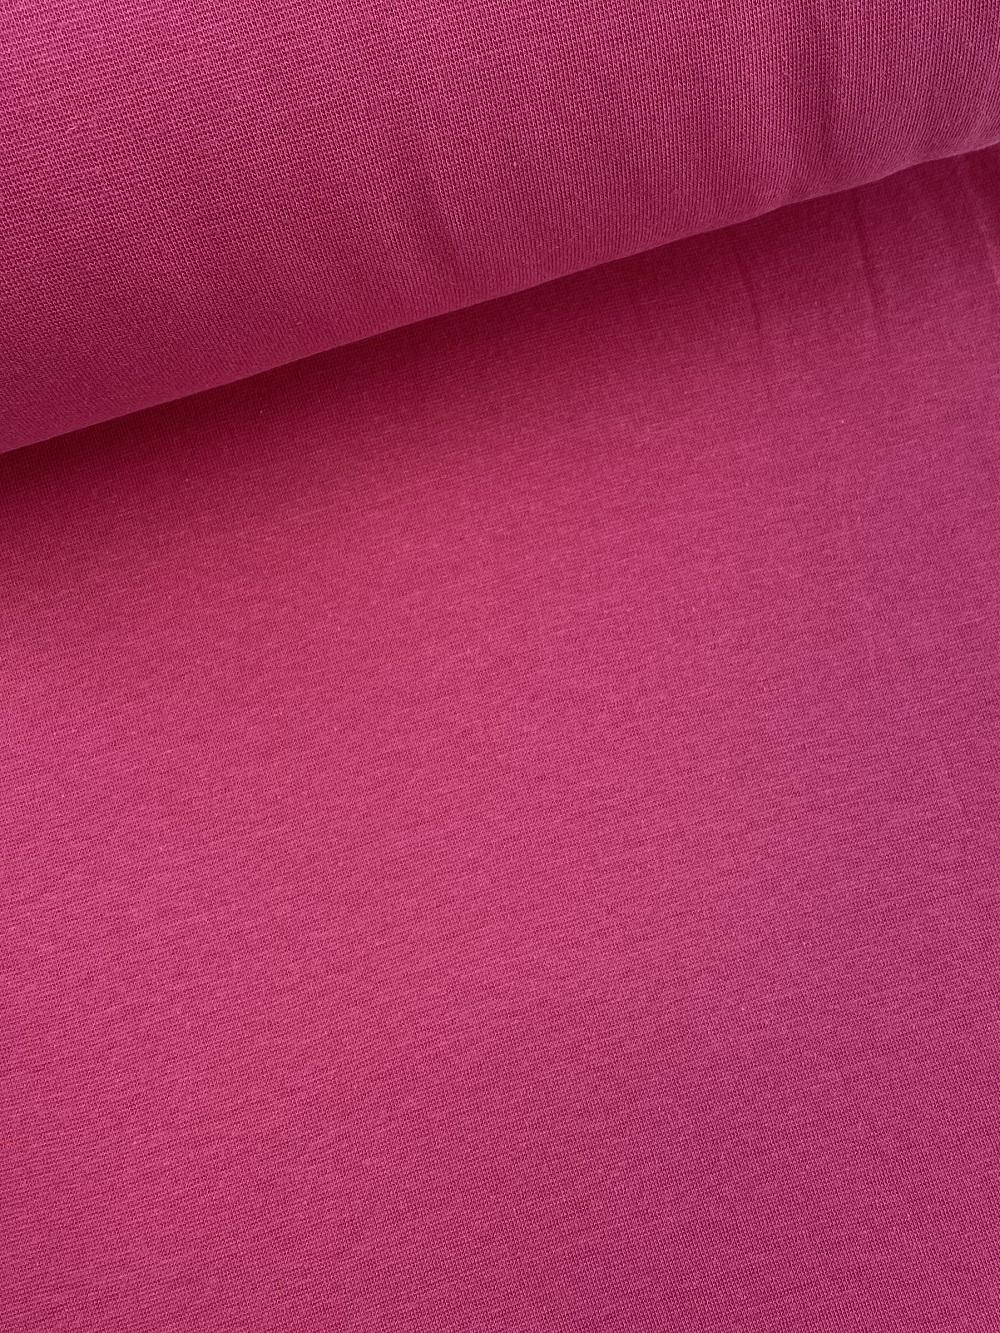 Bündchenware (glatt), pink. Art. SW10622